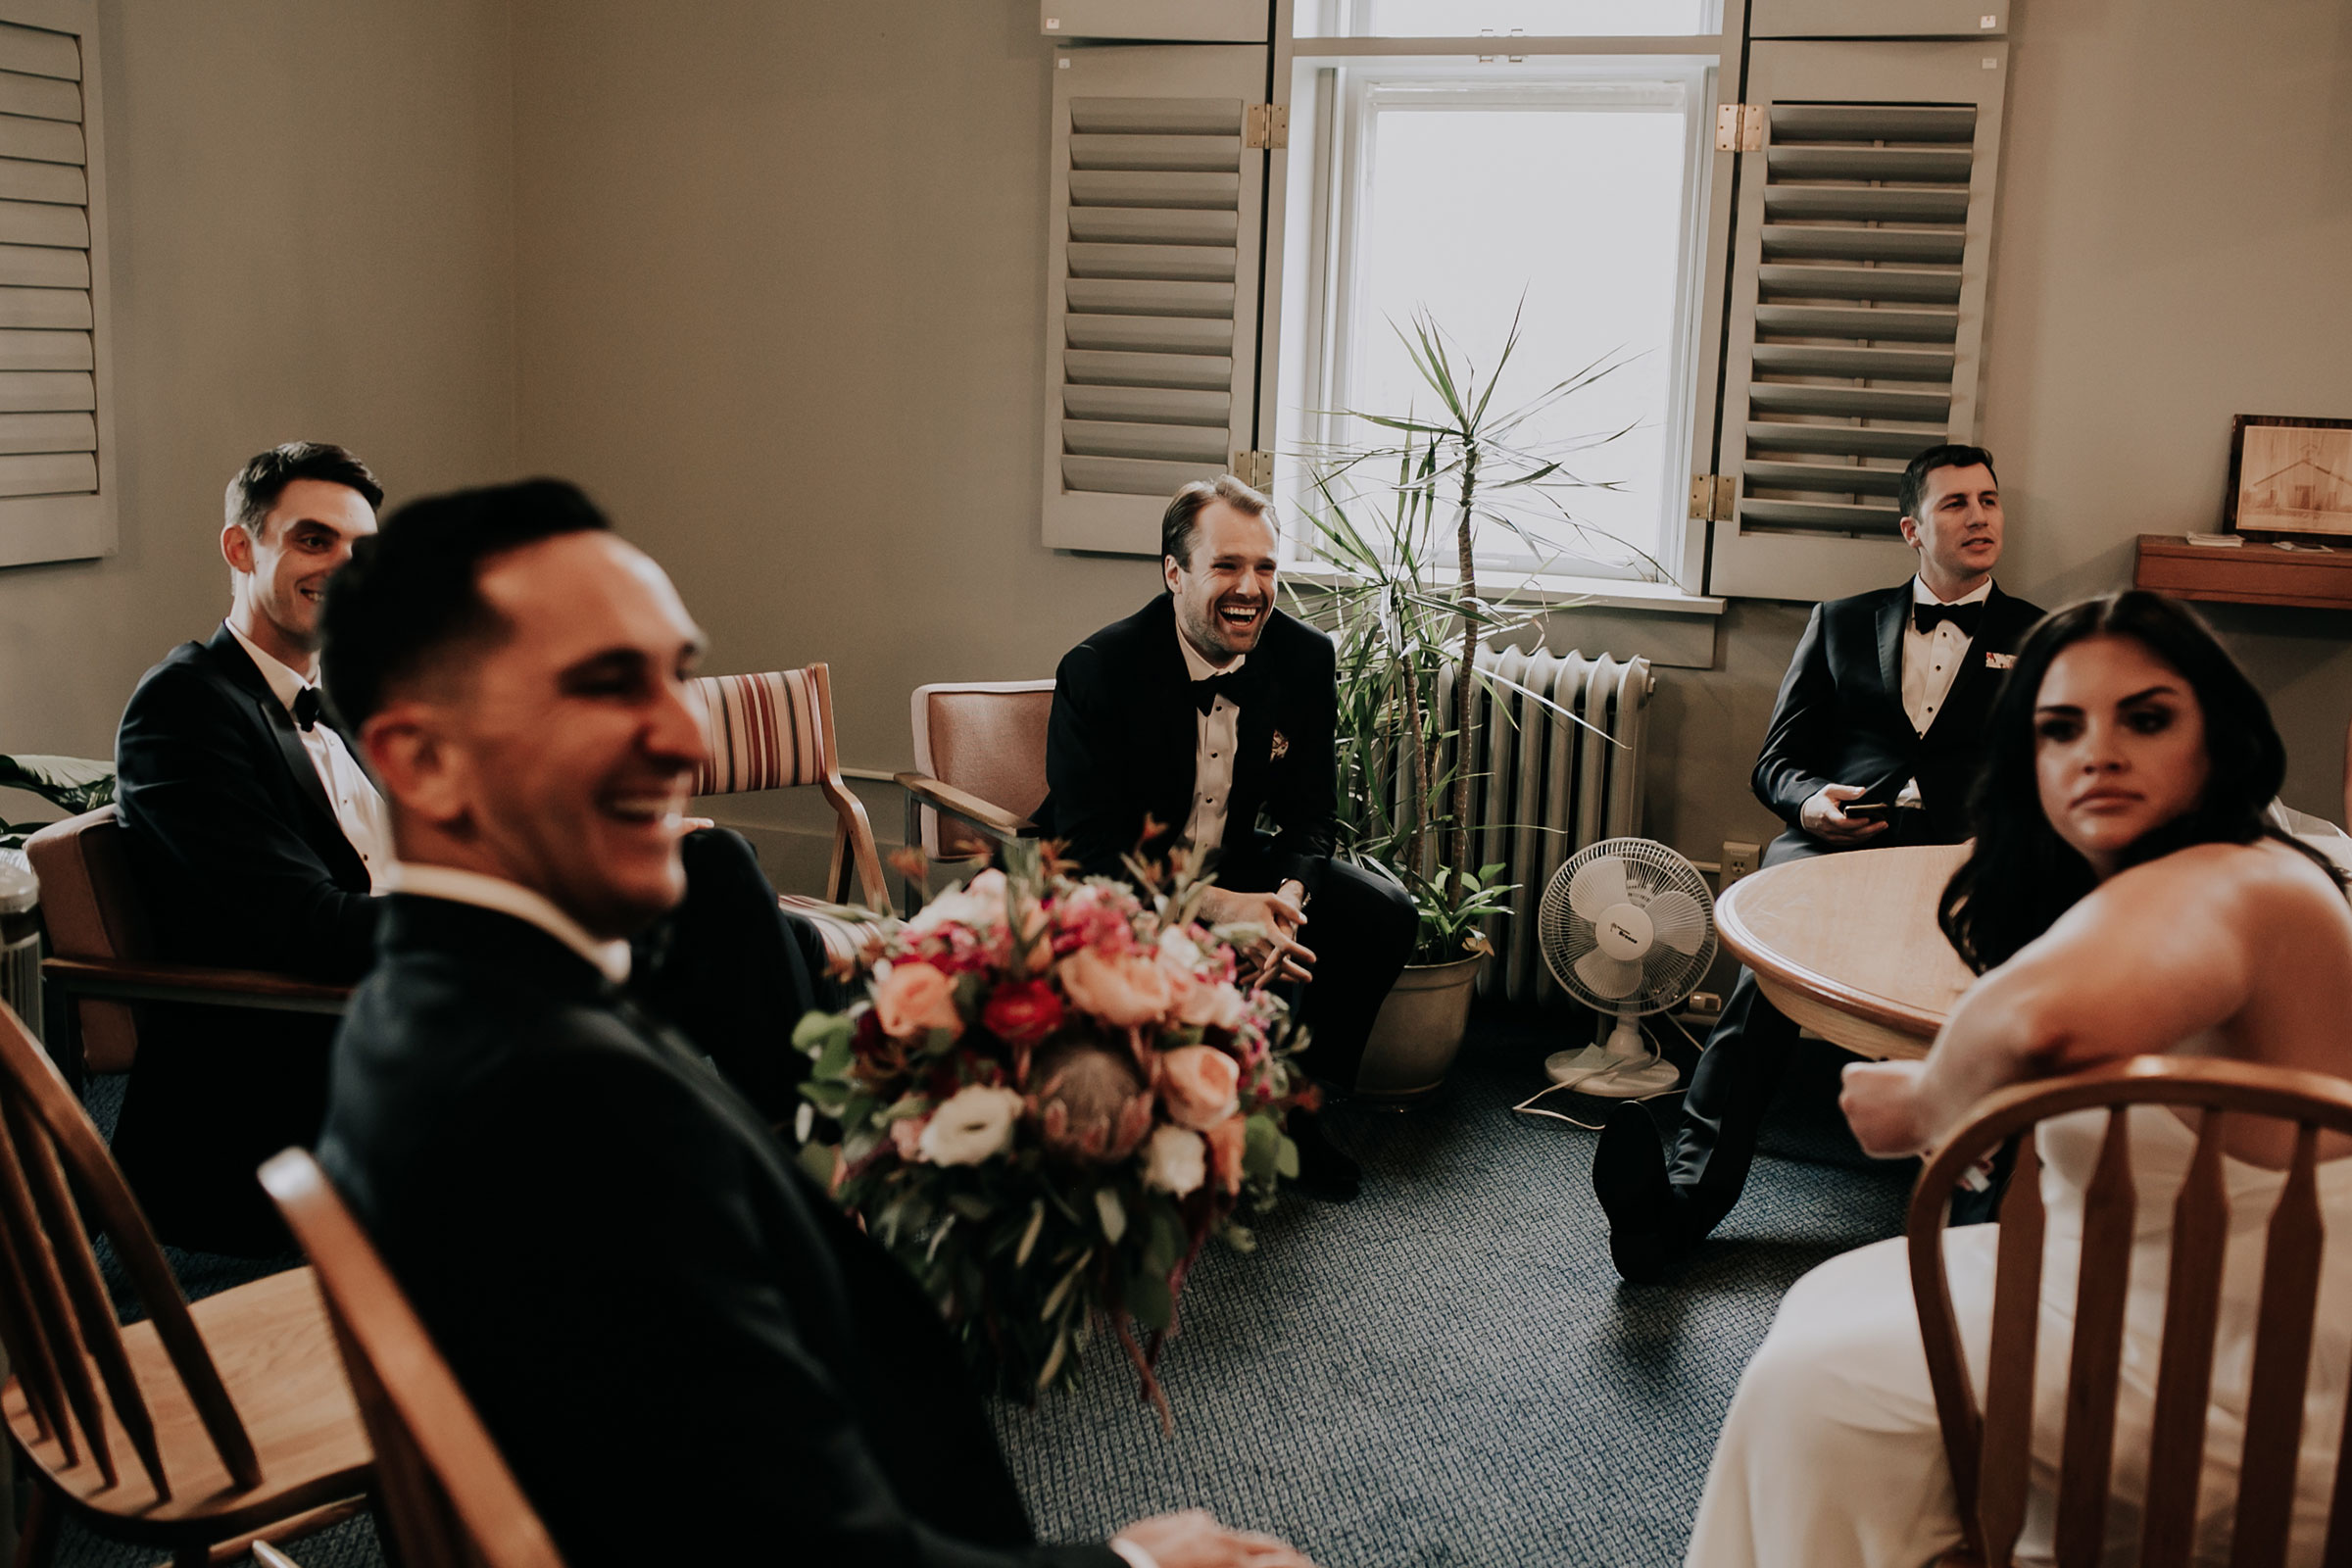 wedding-party-hanging-out-before-ceremony-st-johns-church-at-creighton-omaha-nebraska-raelyn-ramey-photography.jpg